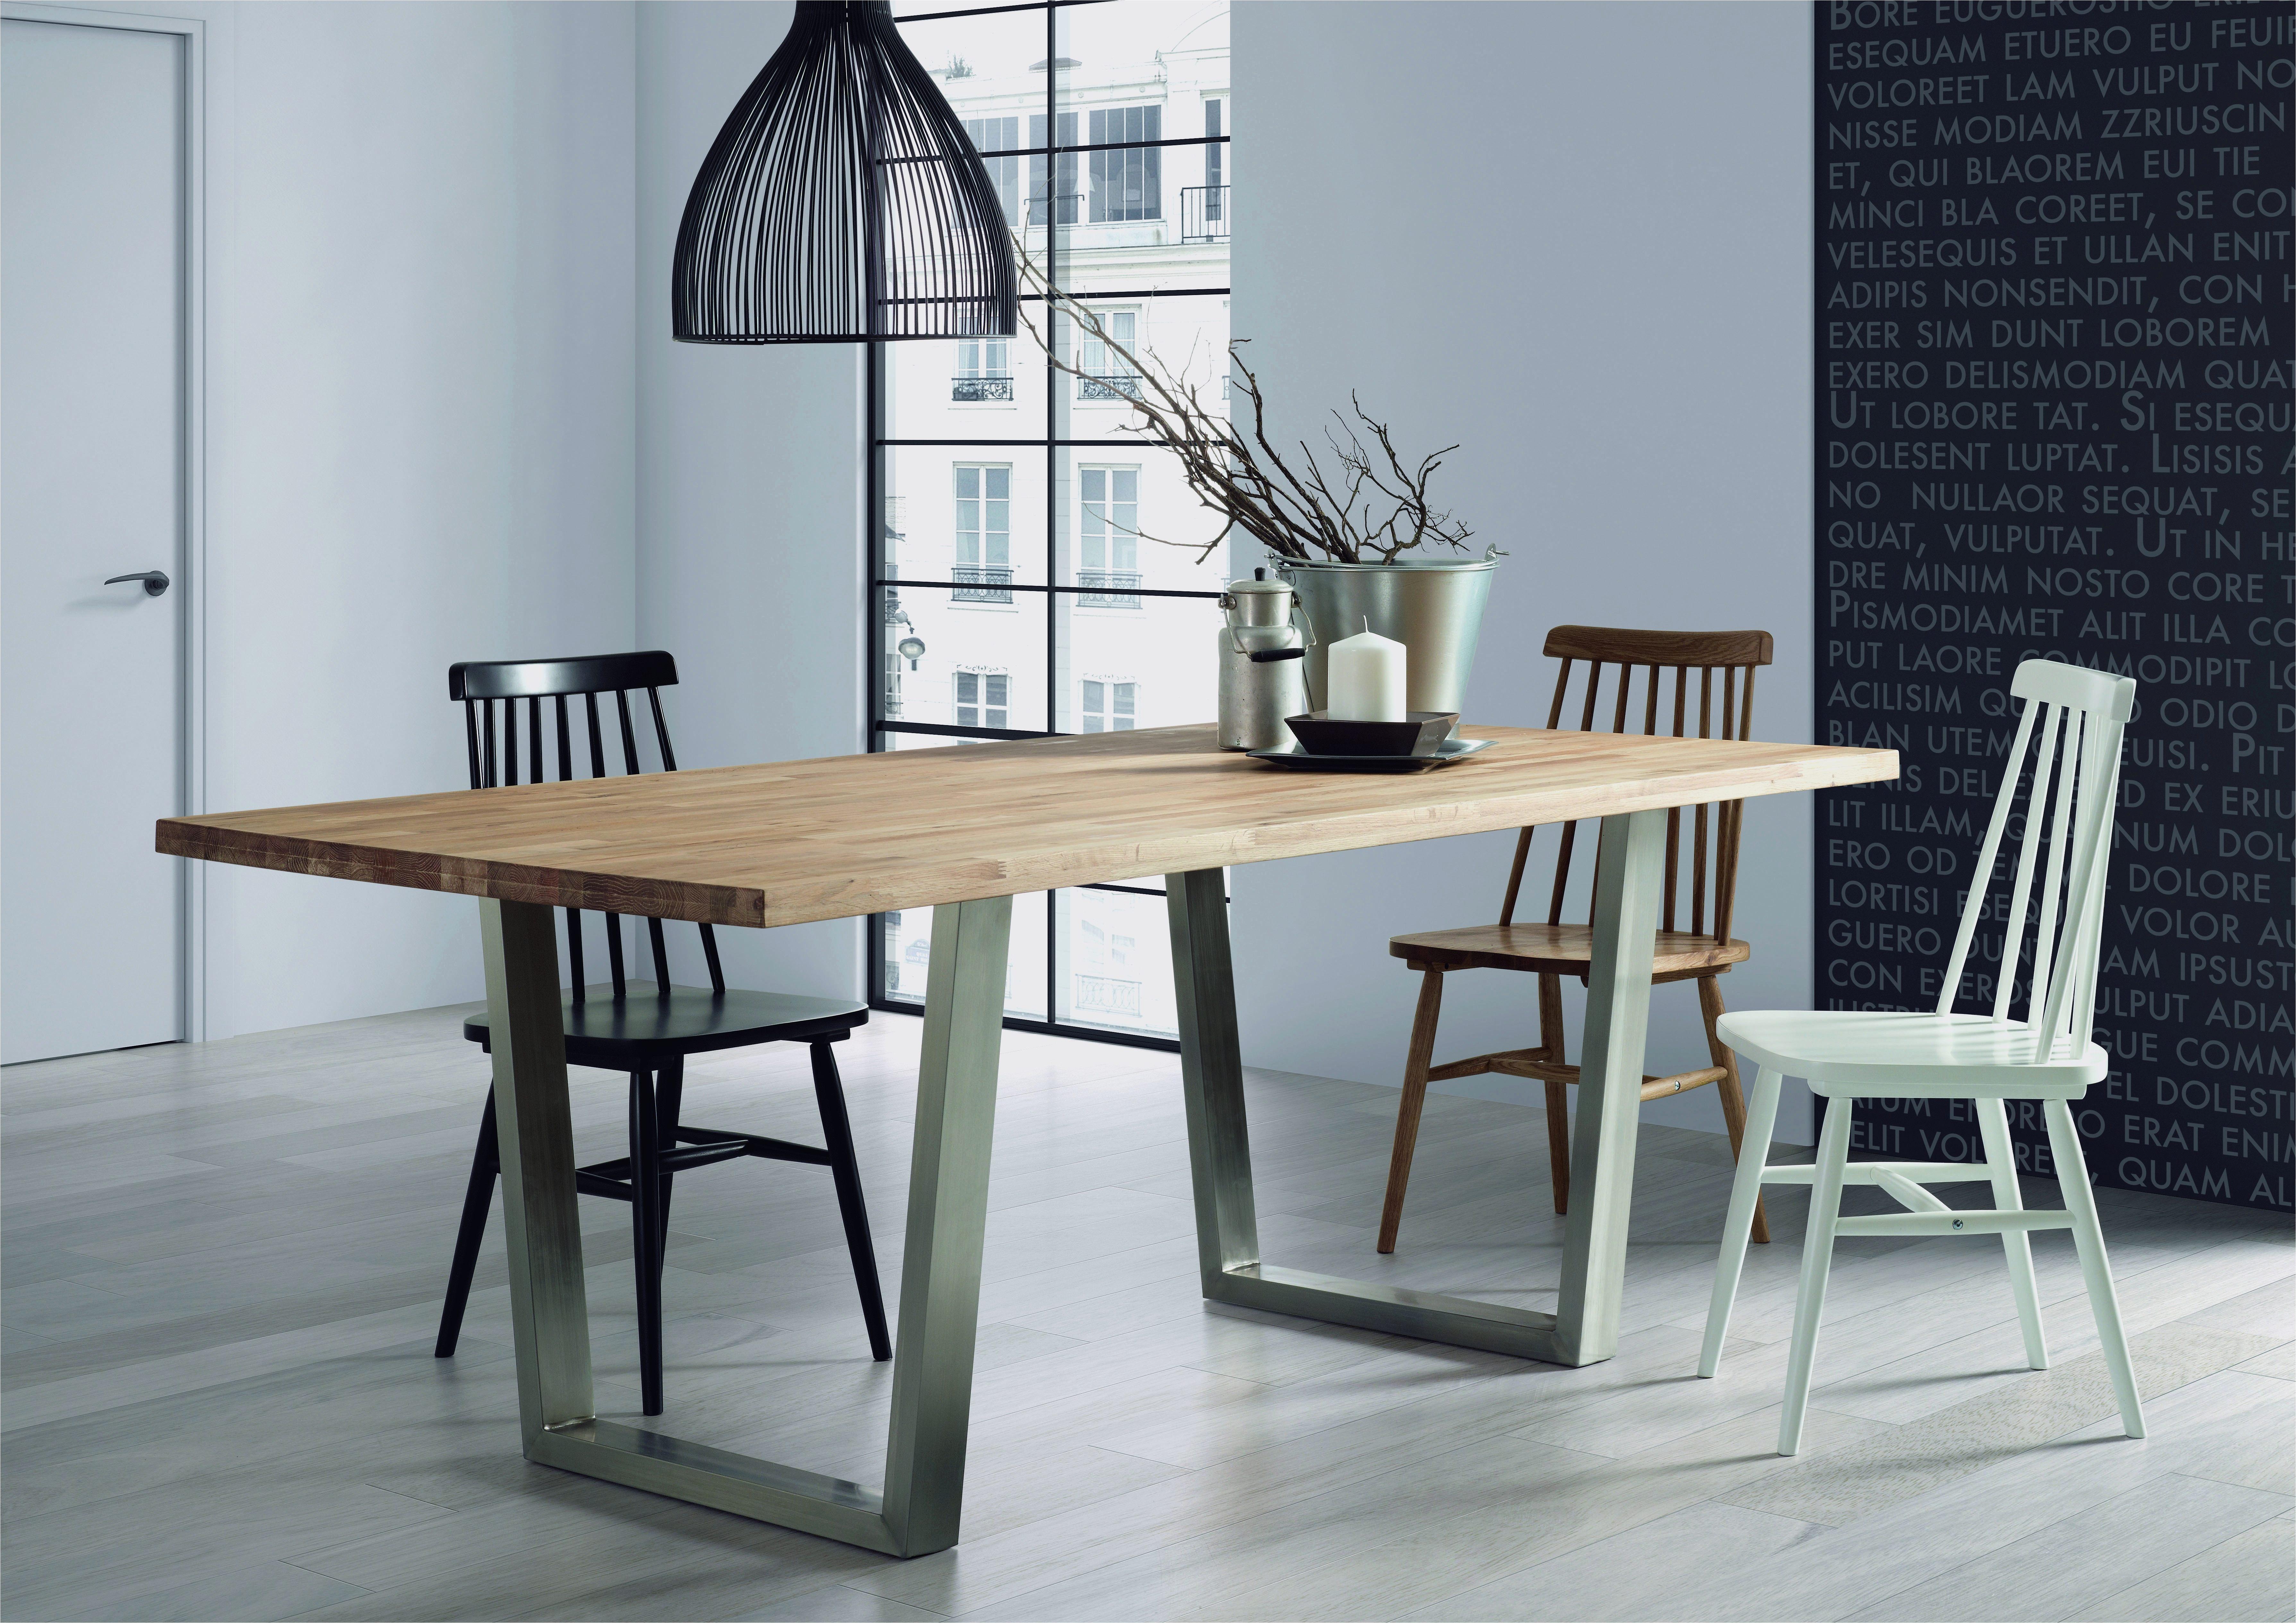 Glamour Ikea Lit Armoire Escamotable Sur Bureau Pliable Mural Ikea